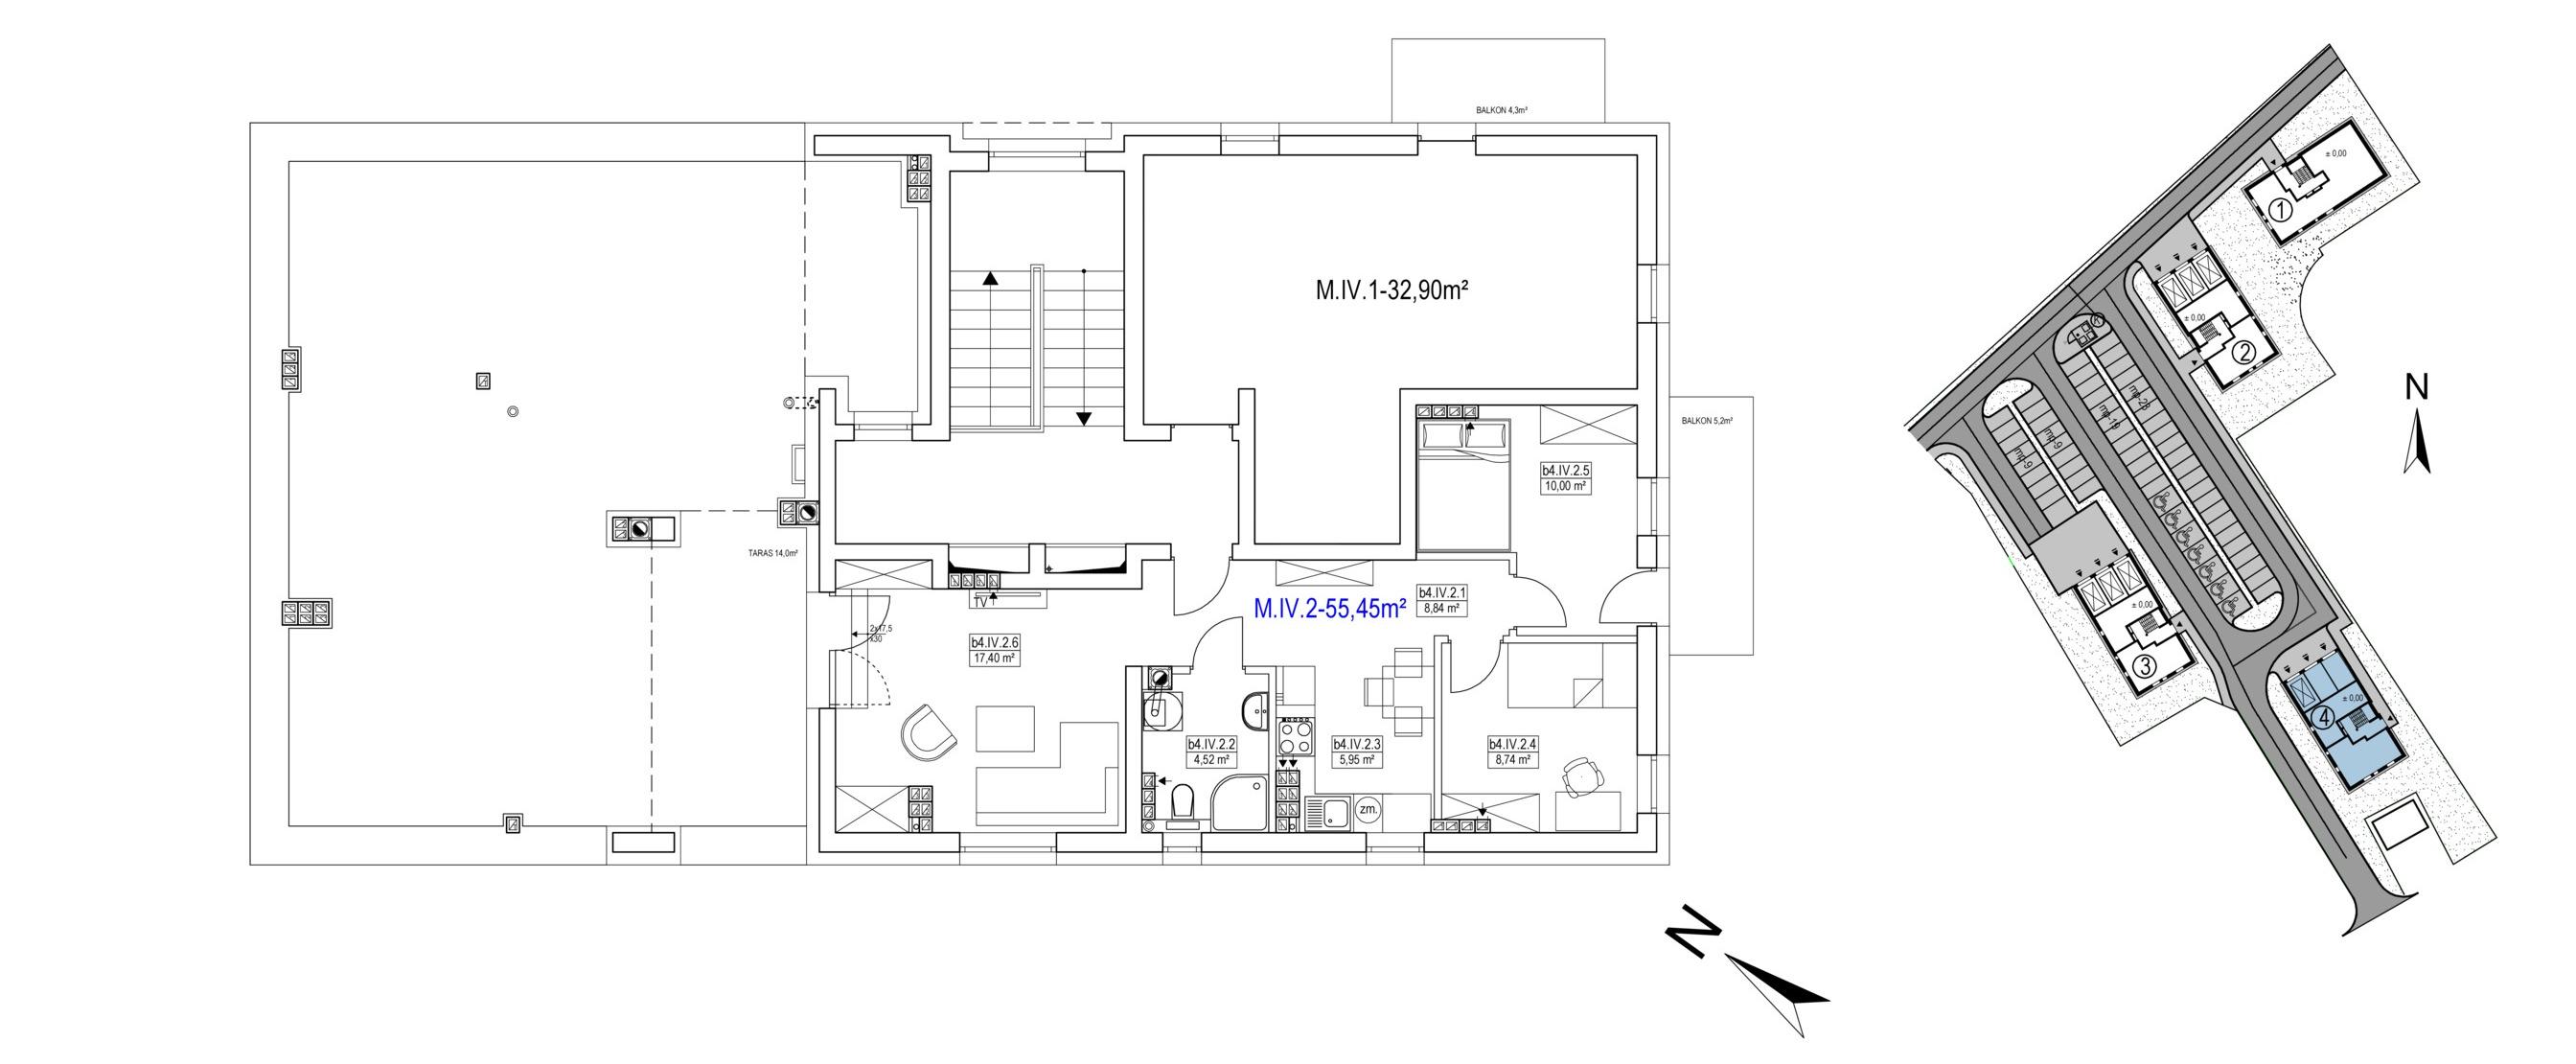 /assets/img/flats/B4.M.IV.2.jpg